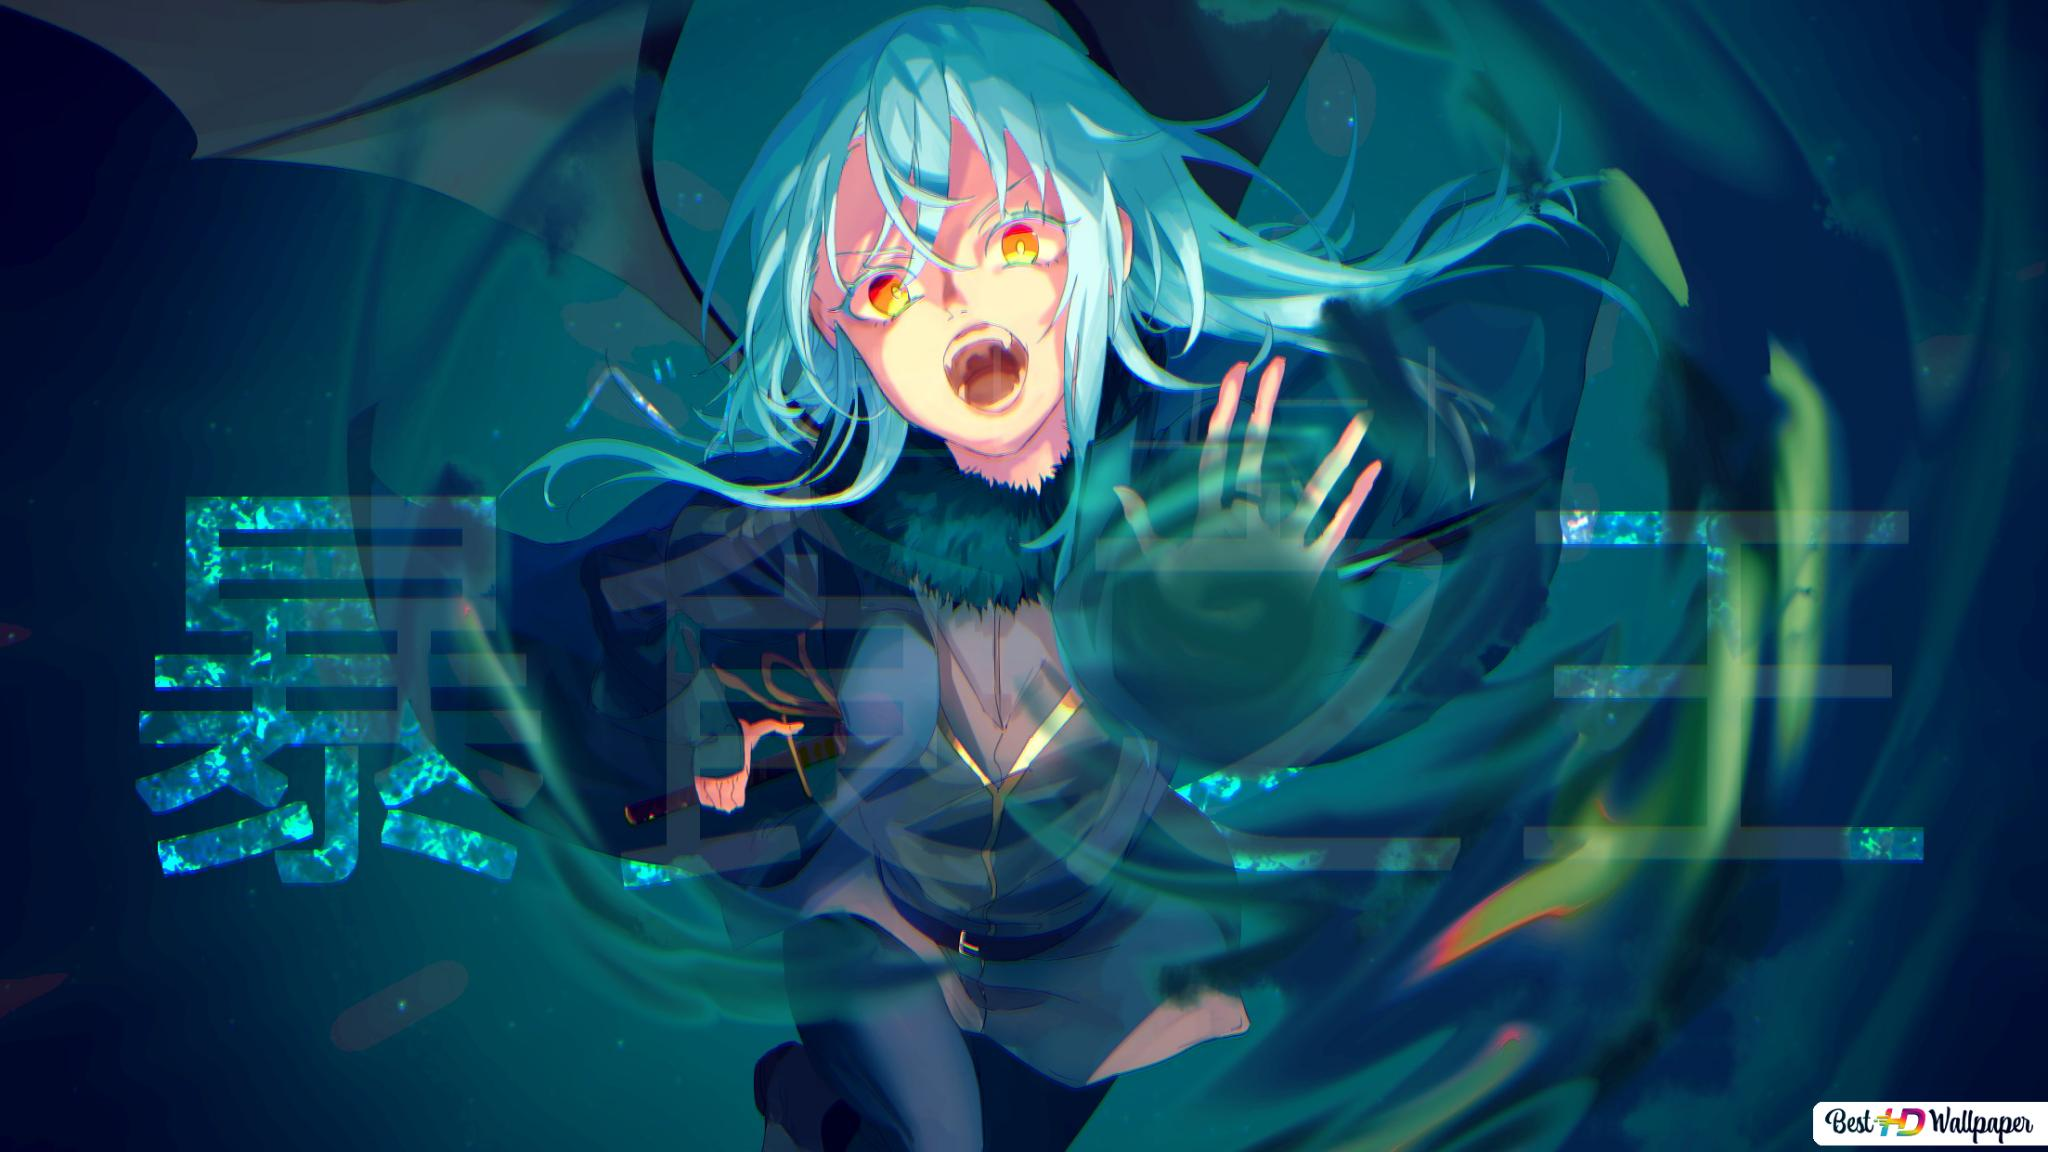 Tensei Shitara Slime Datta Ken Rimuru Tempest Hd Wallpaper Download